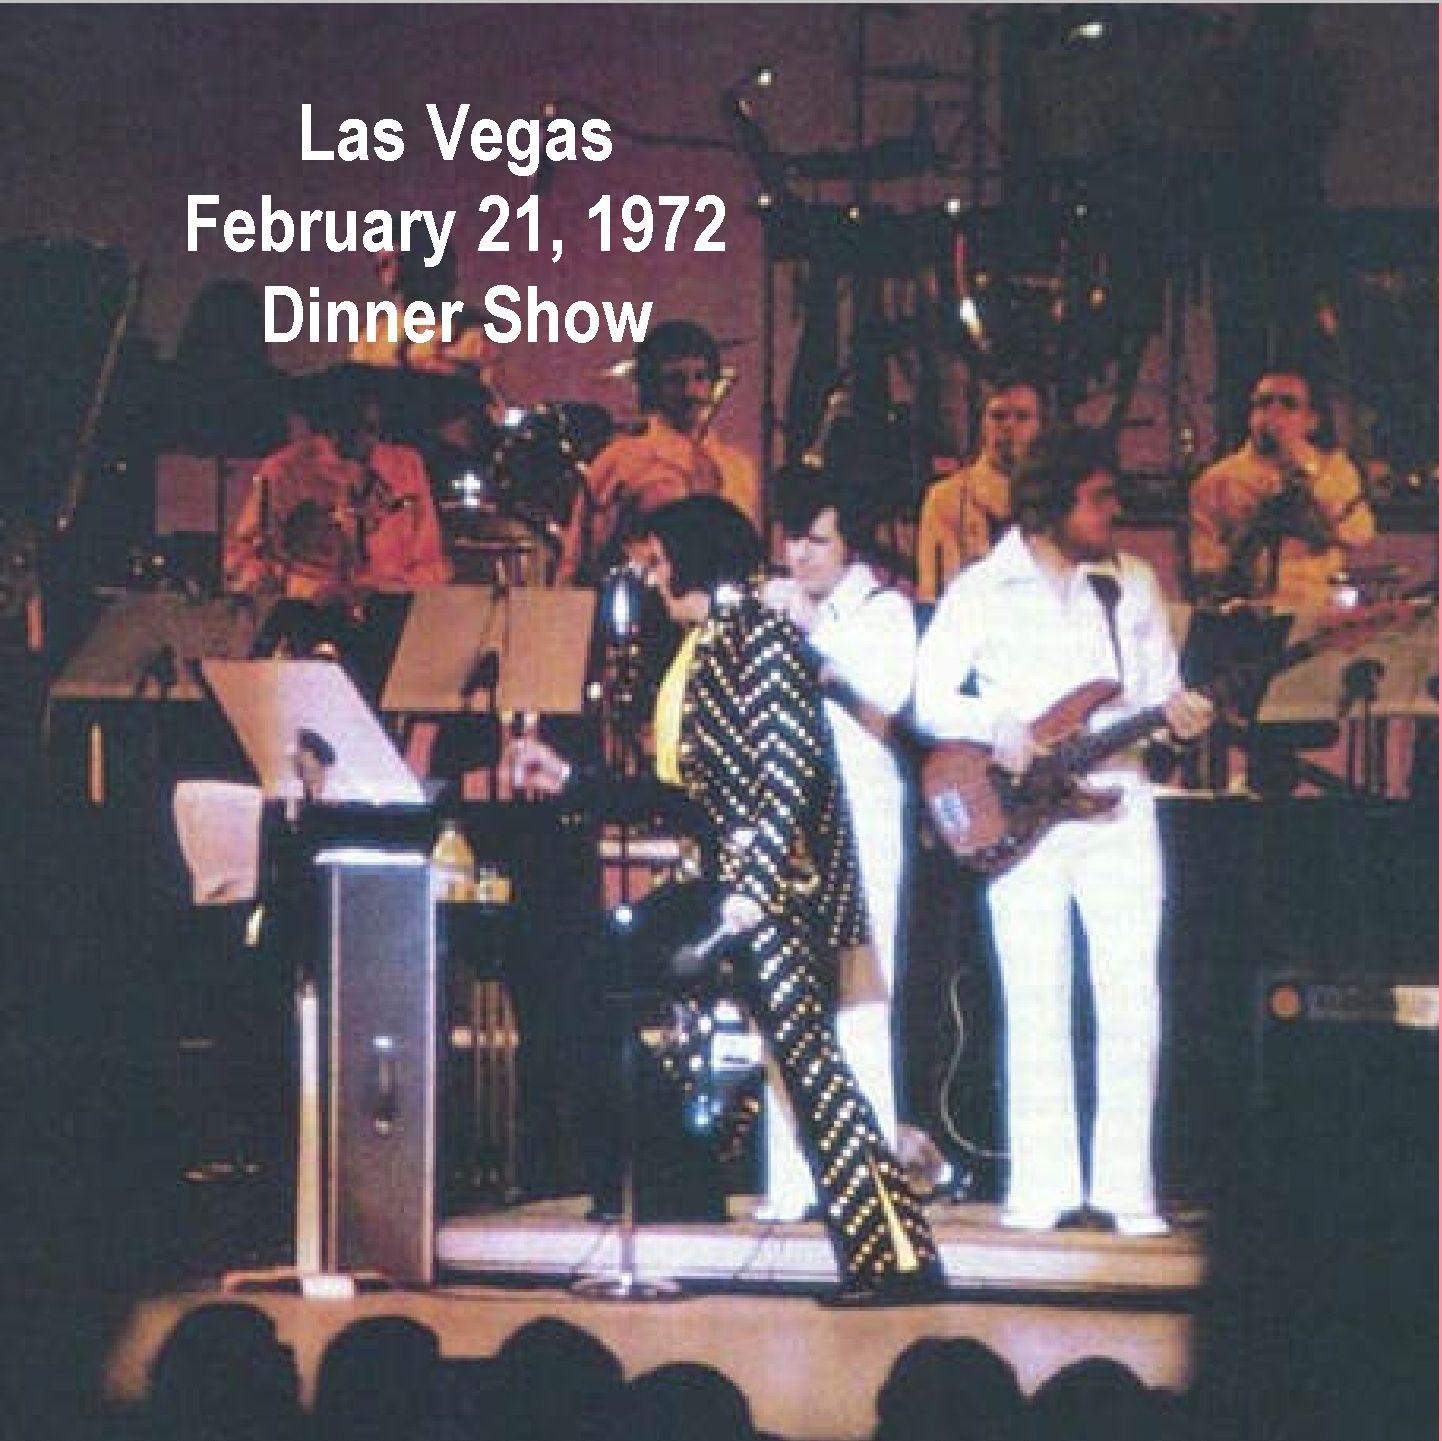 Las Vegas Dinner Shows  ELVIS JAR LAS VEGAS FEBRUARY 21 1972 DINNER SHOW